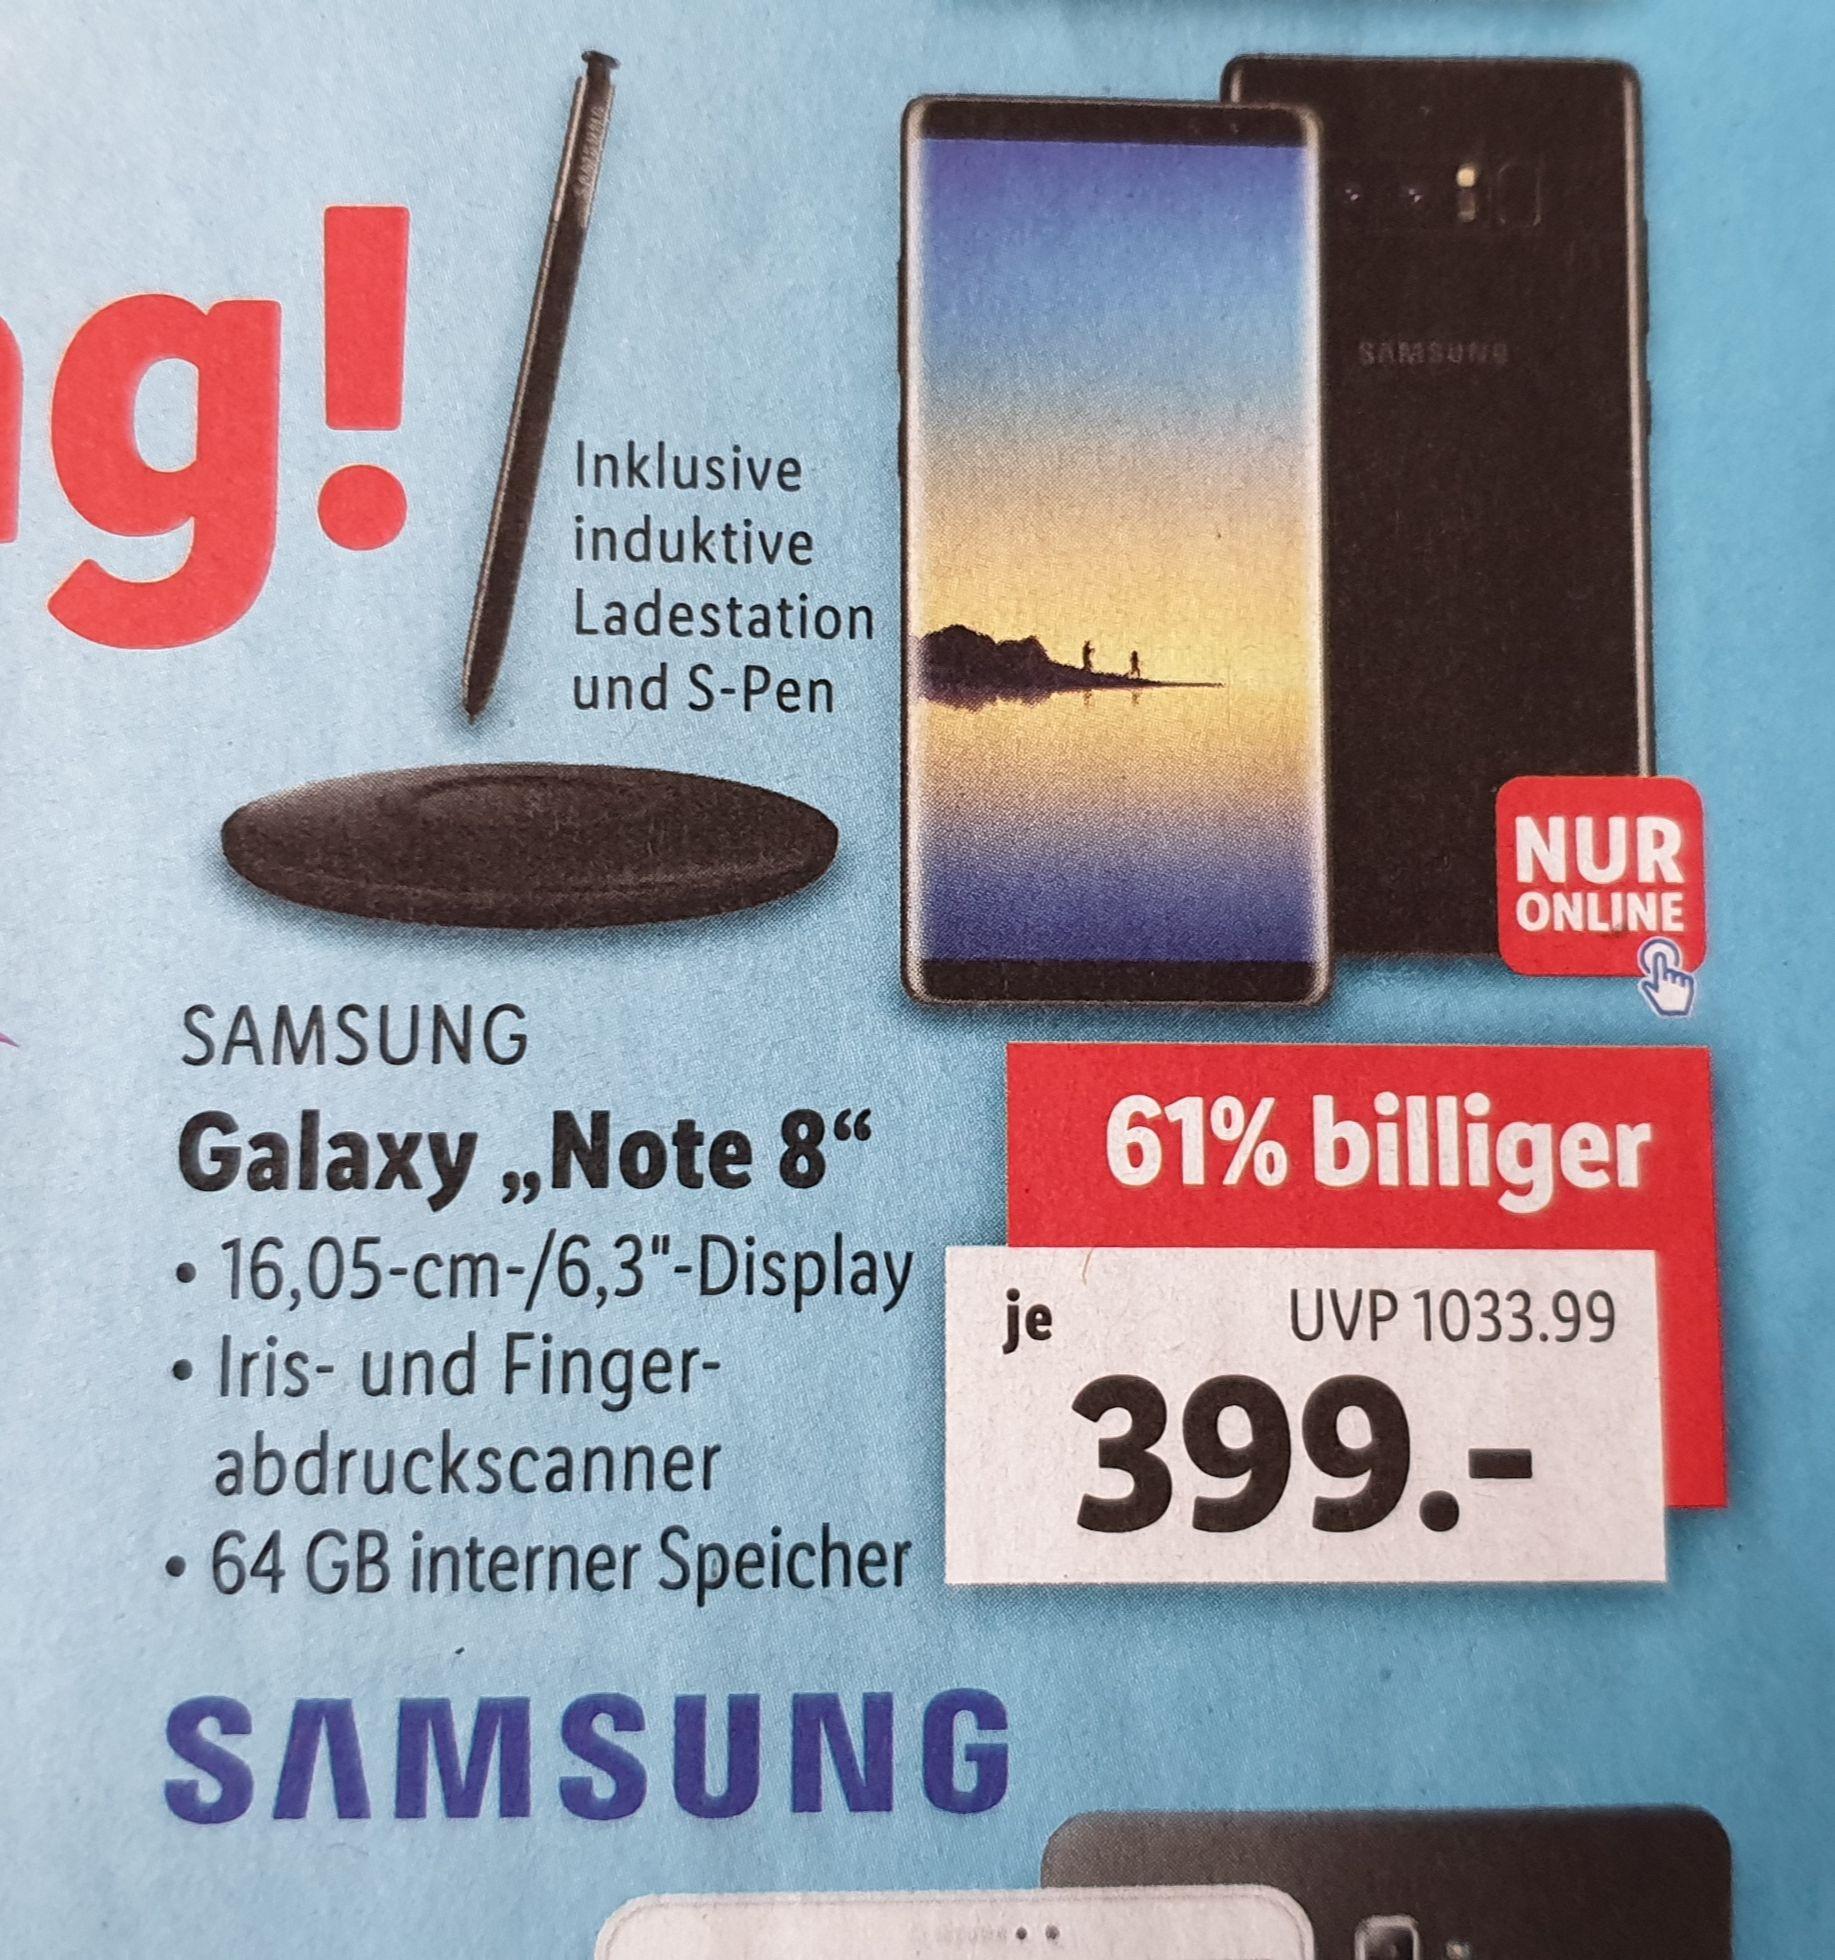 Samsung Galaxy Note 8 + Induktive Ladestation [Lidl]